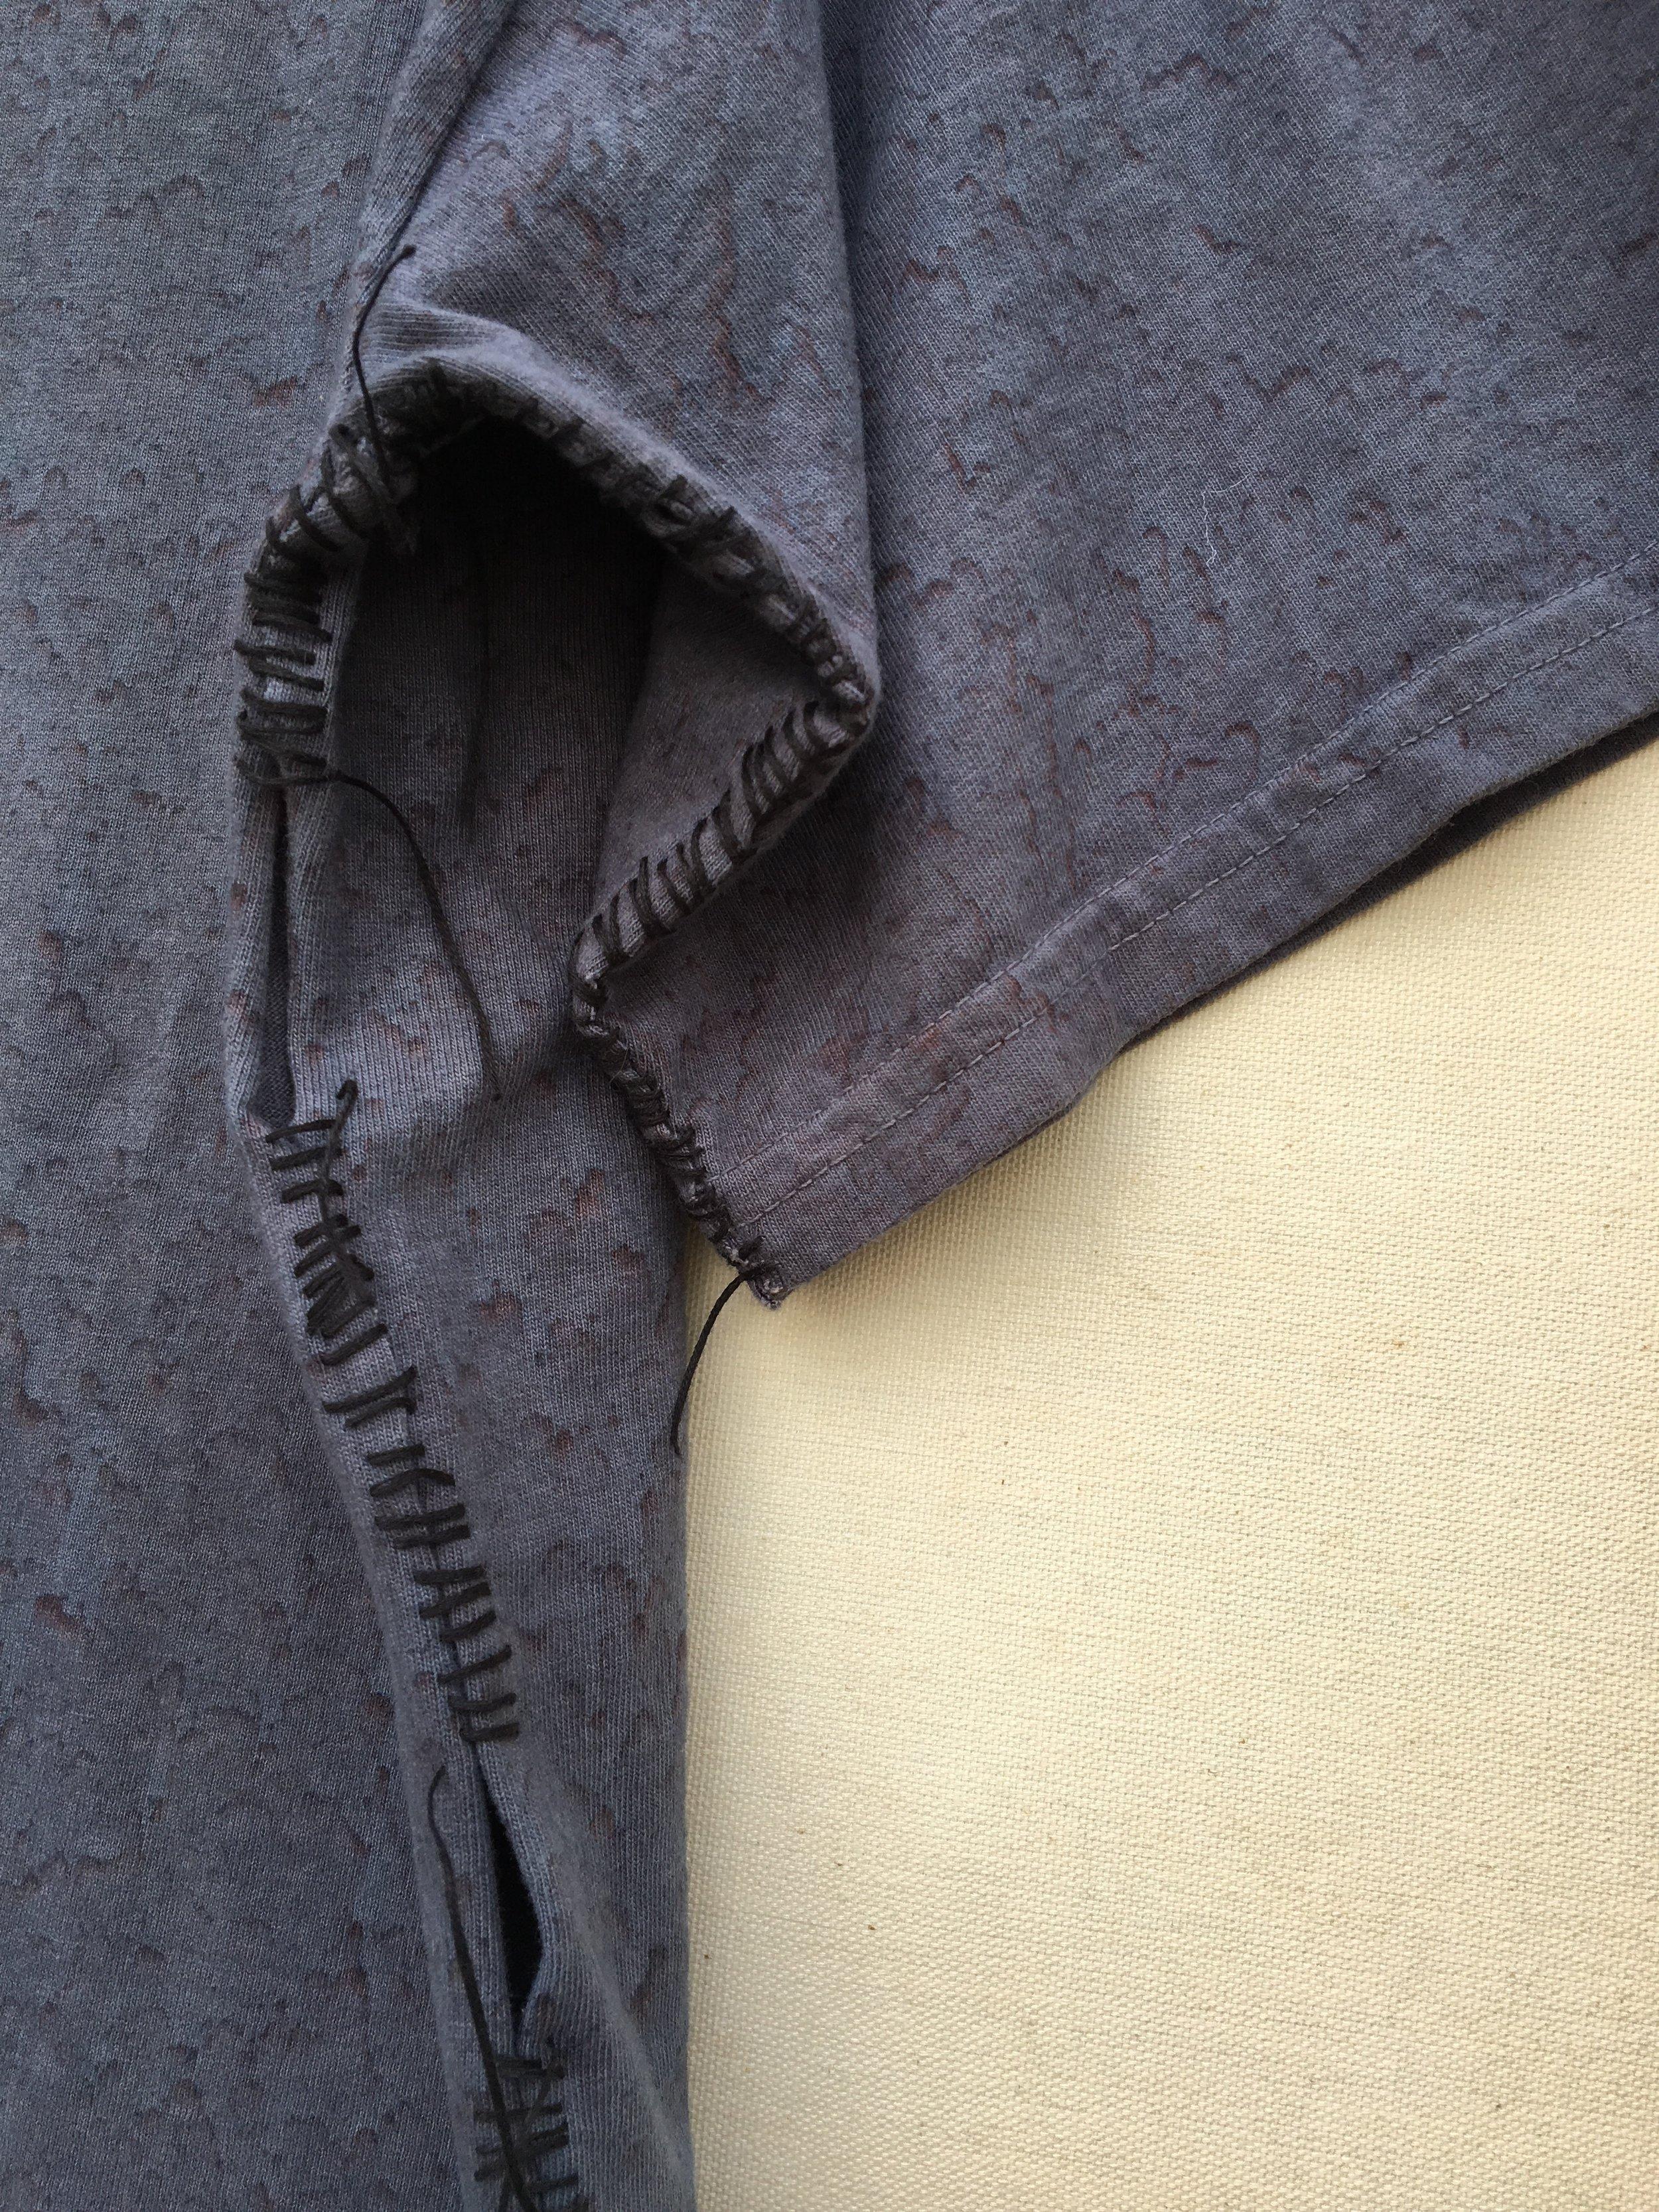 shirt 19_side seam detail.JPG